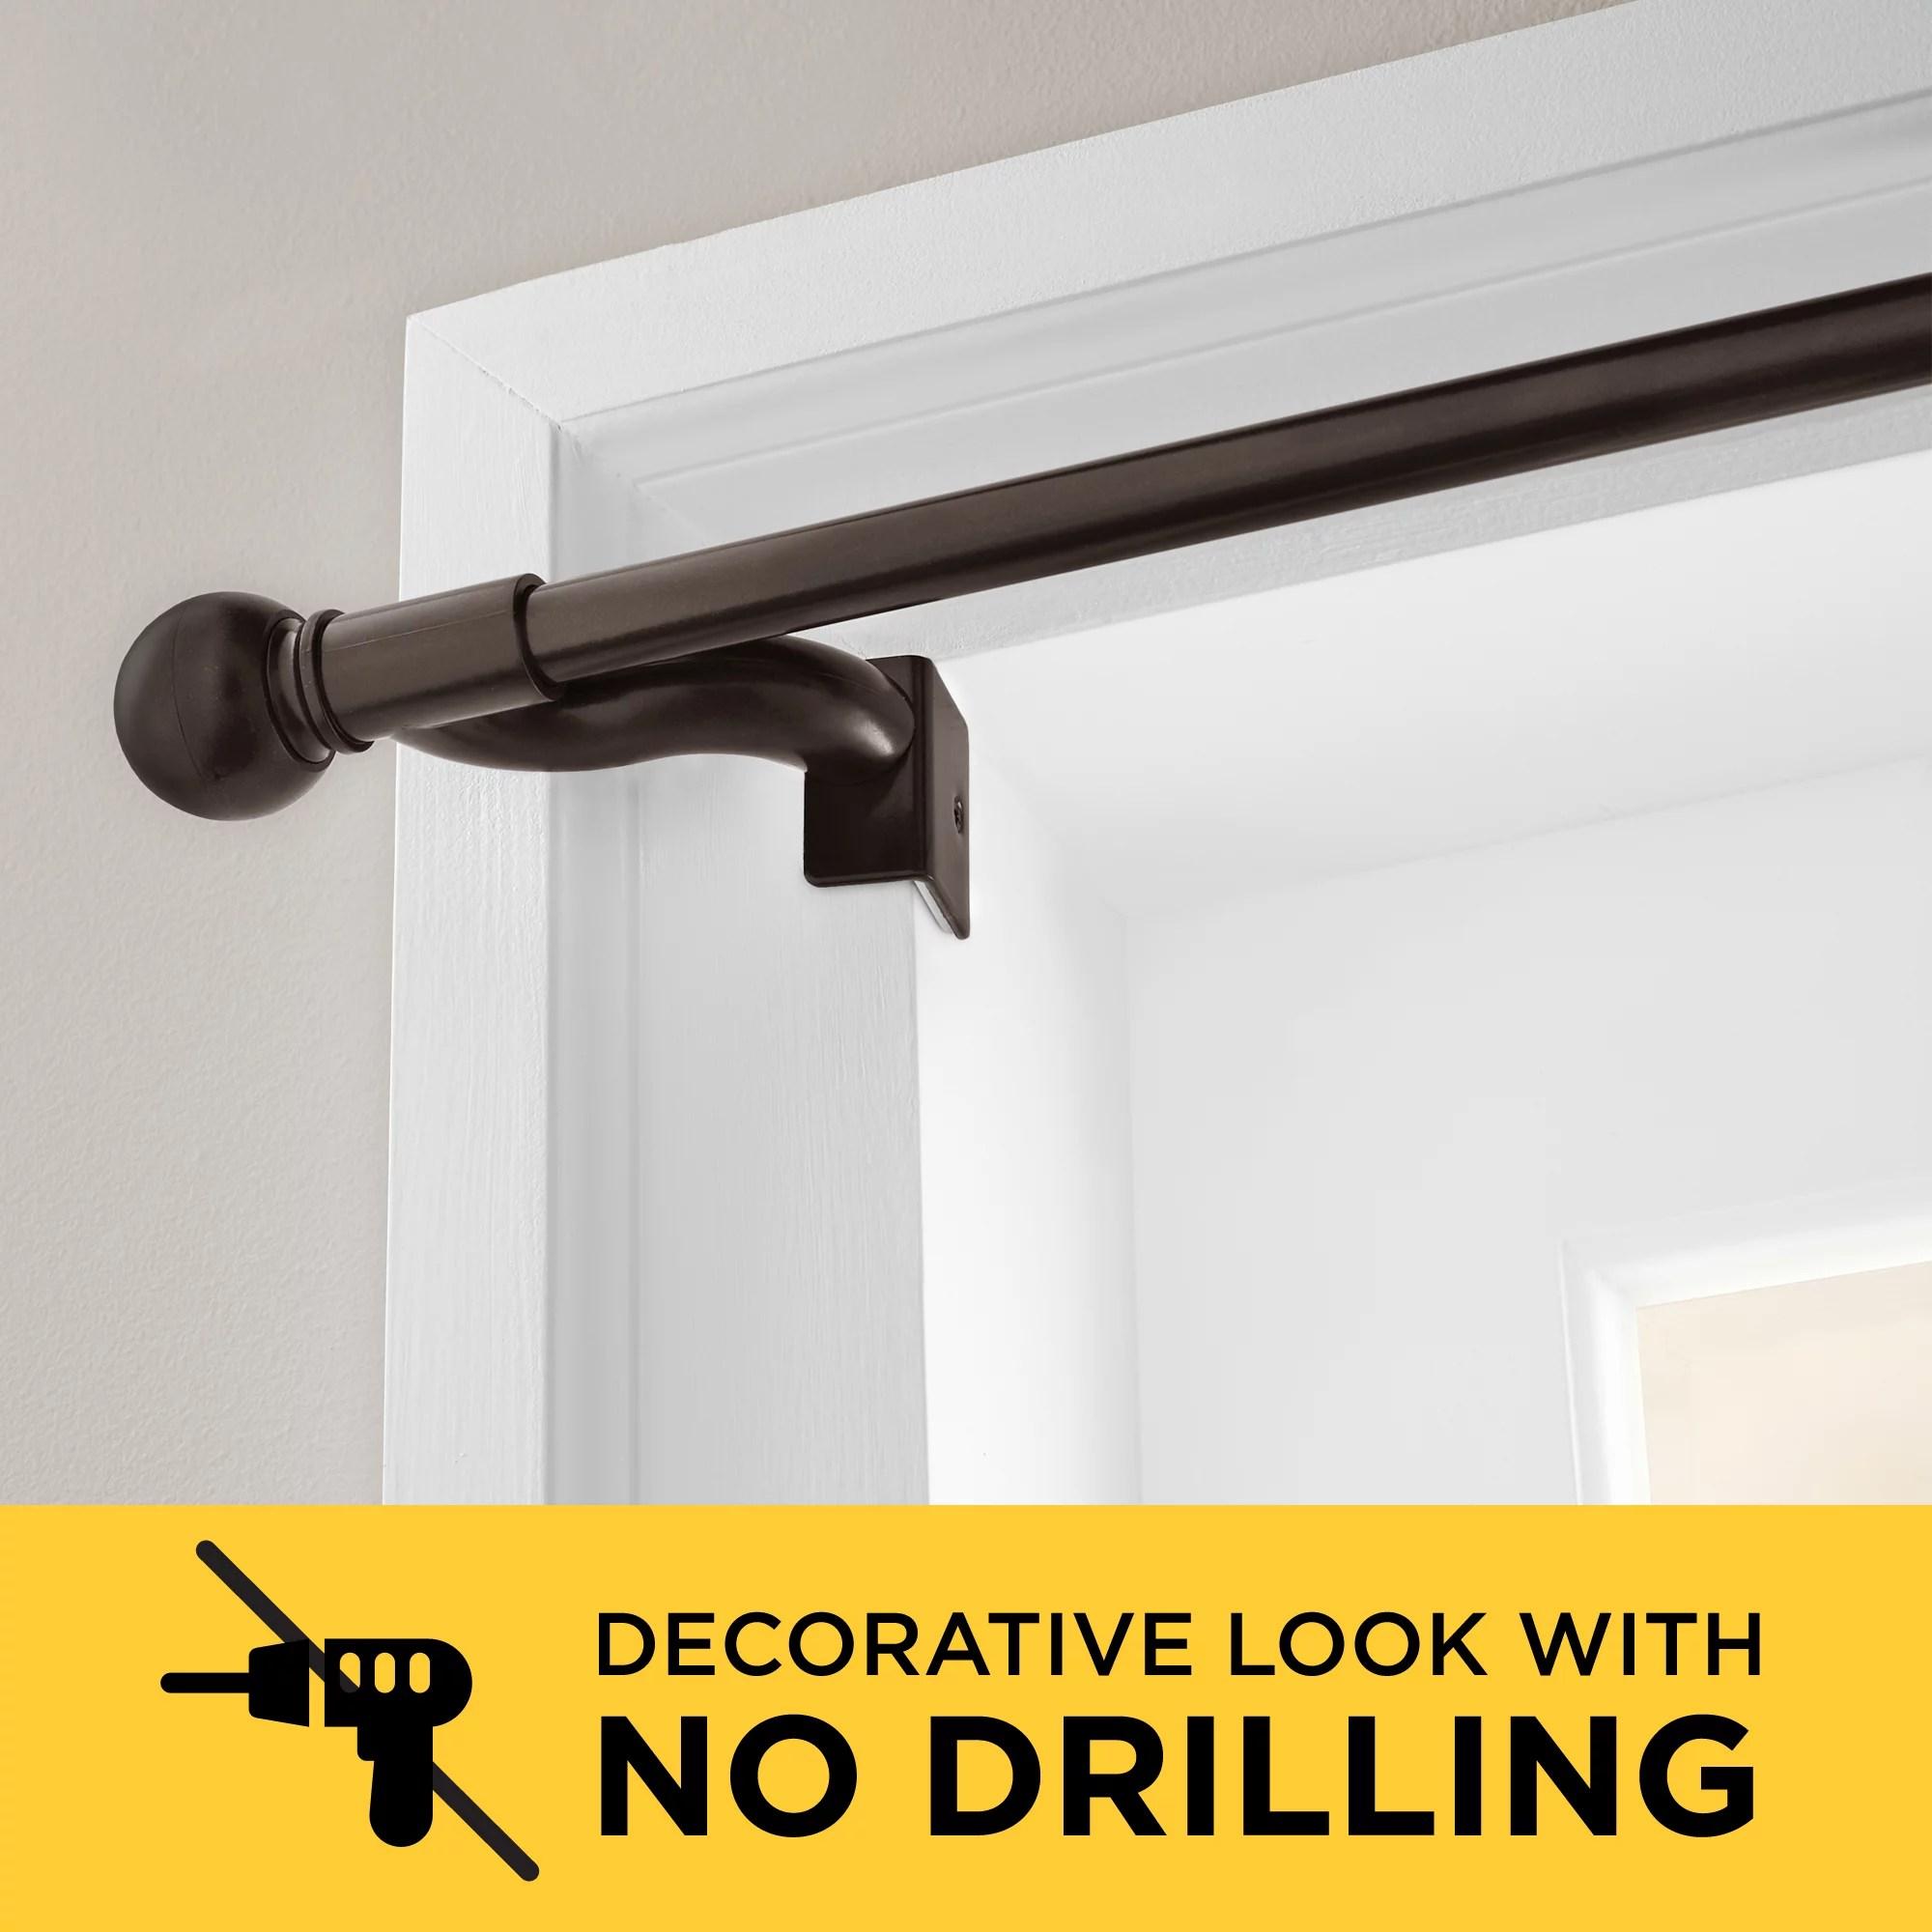 Smart Rods Twist And Shout No Drill Adjustable Window Curtain Tension Rod Walmart Com Walmart Com